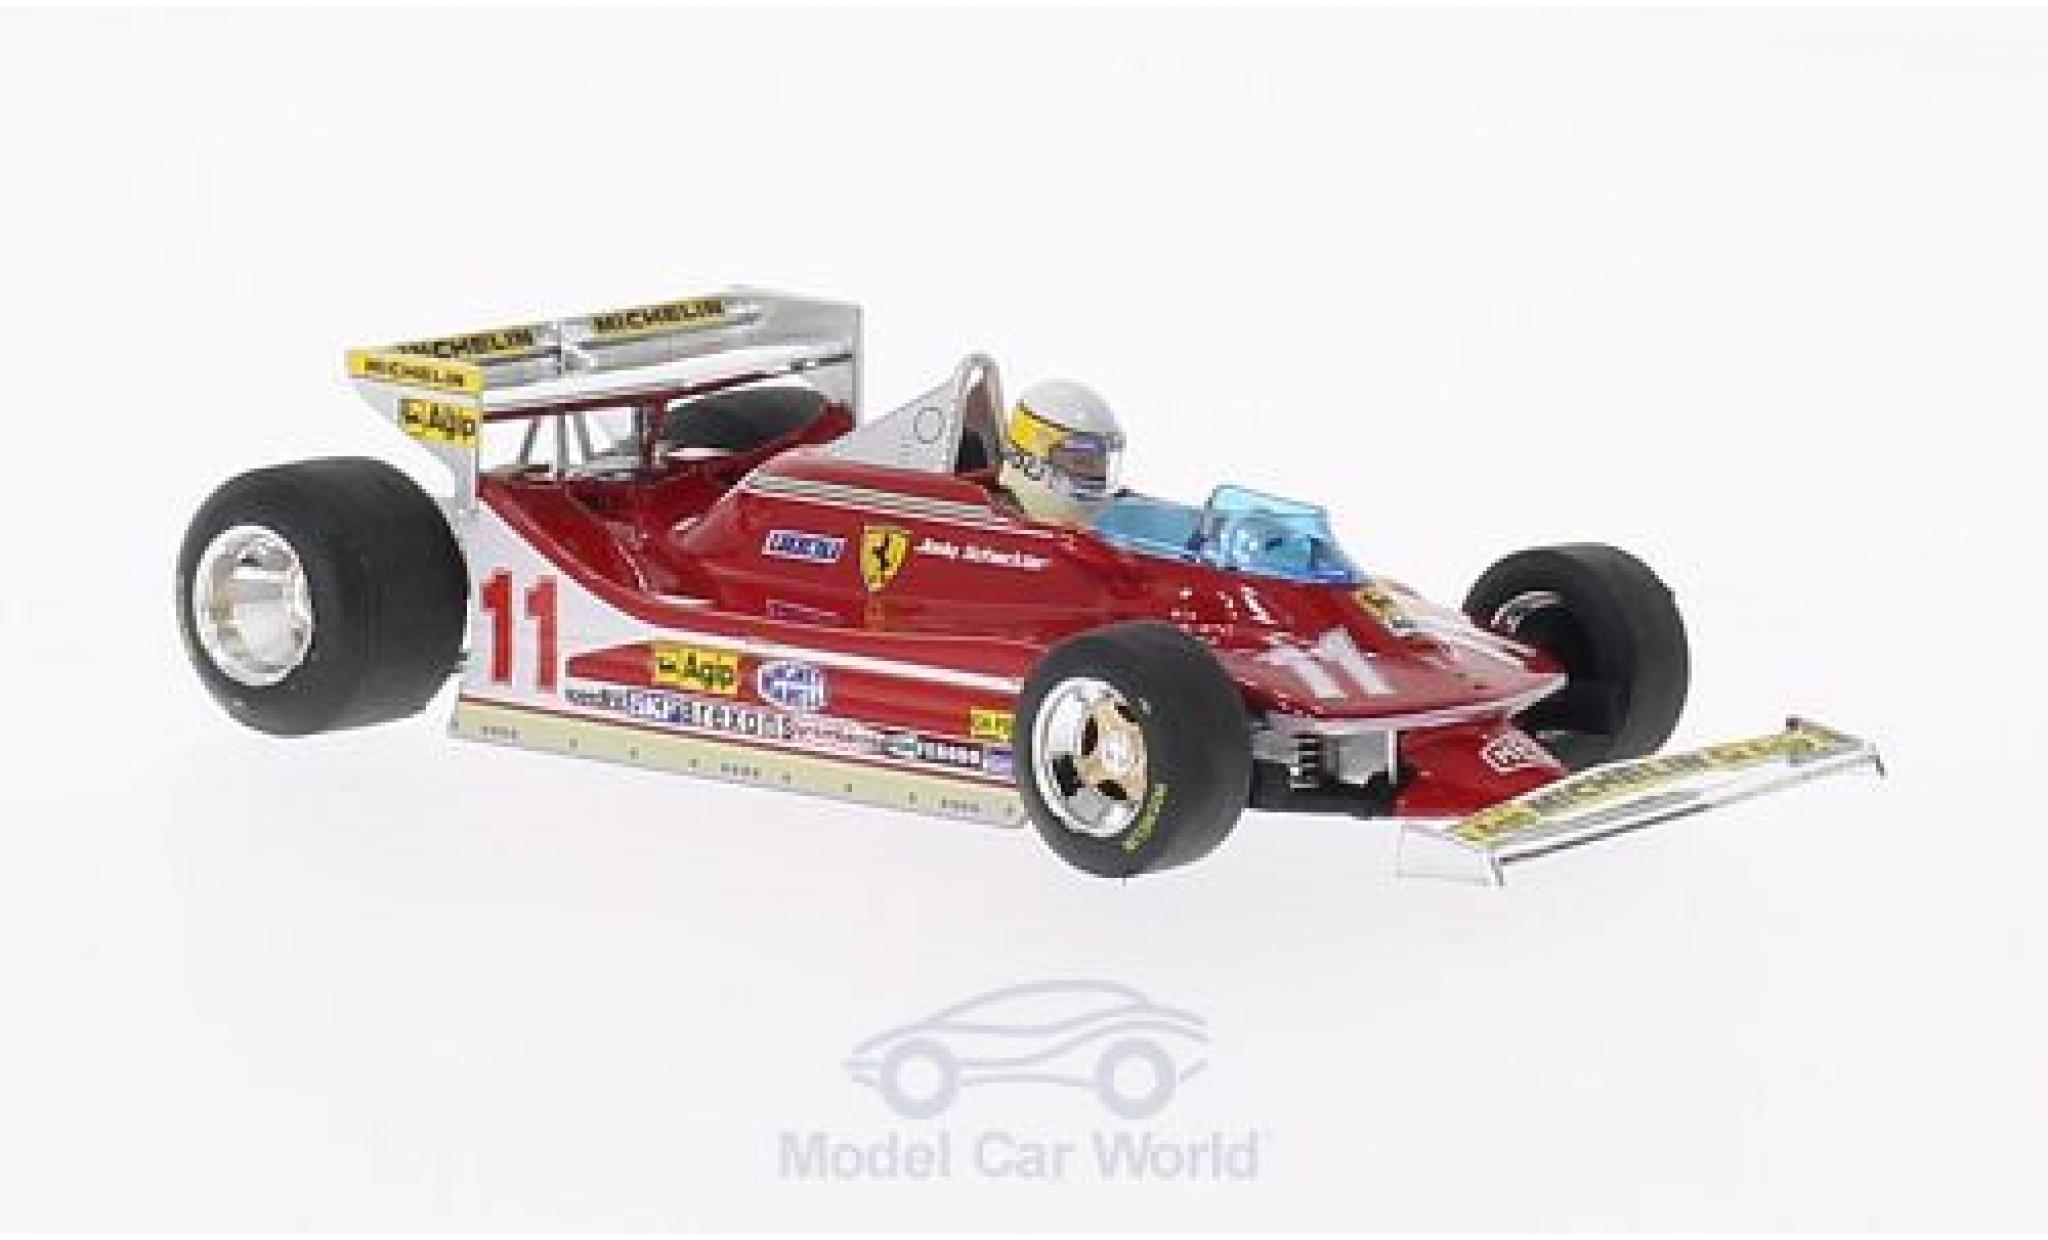 Ferrari 312 T4 1/43 Brumm T4 No.11 GP Monaco 1979 J.Scheckter